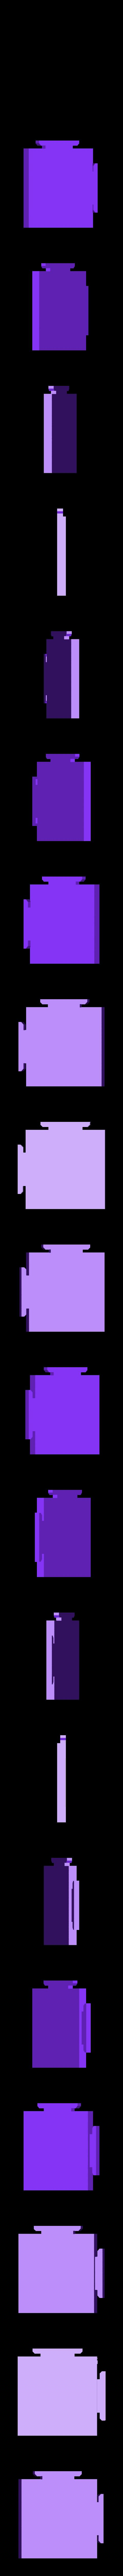 T4.STL Download free STL file Chess set / Chess set • 3D printable model, OC3D